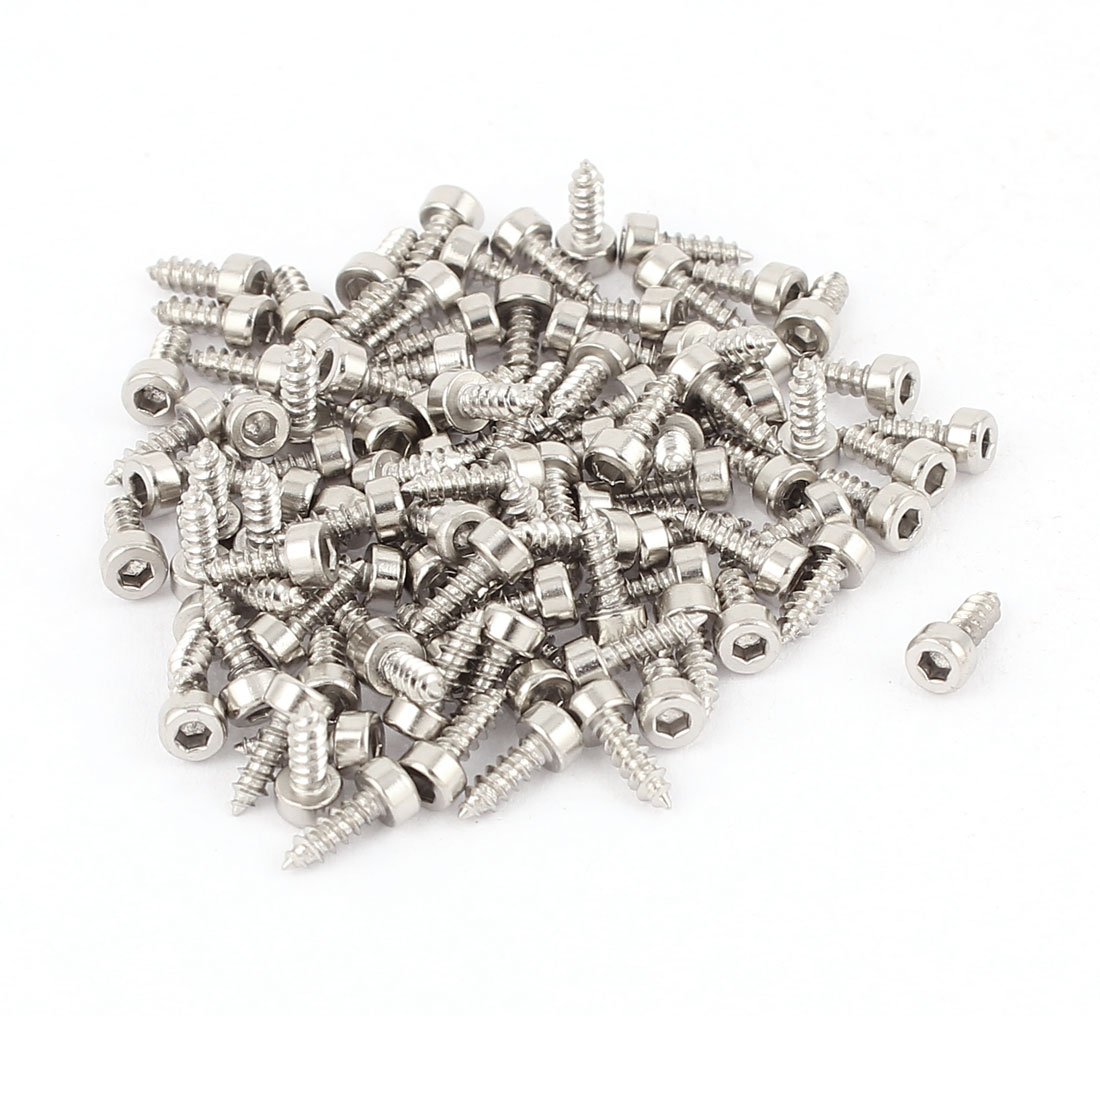 2mm x 6mm Male Thread Nickel Plated Hex Head Self Tapping Screws 100 Pcs